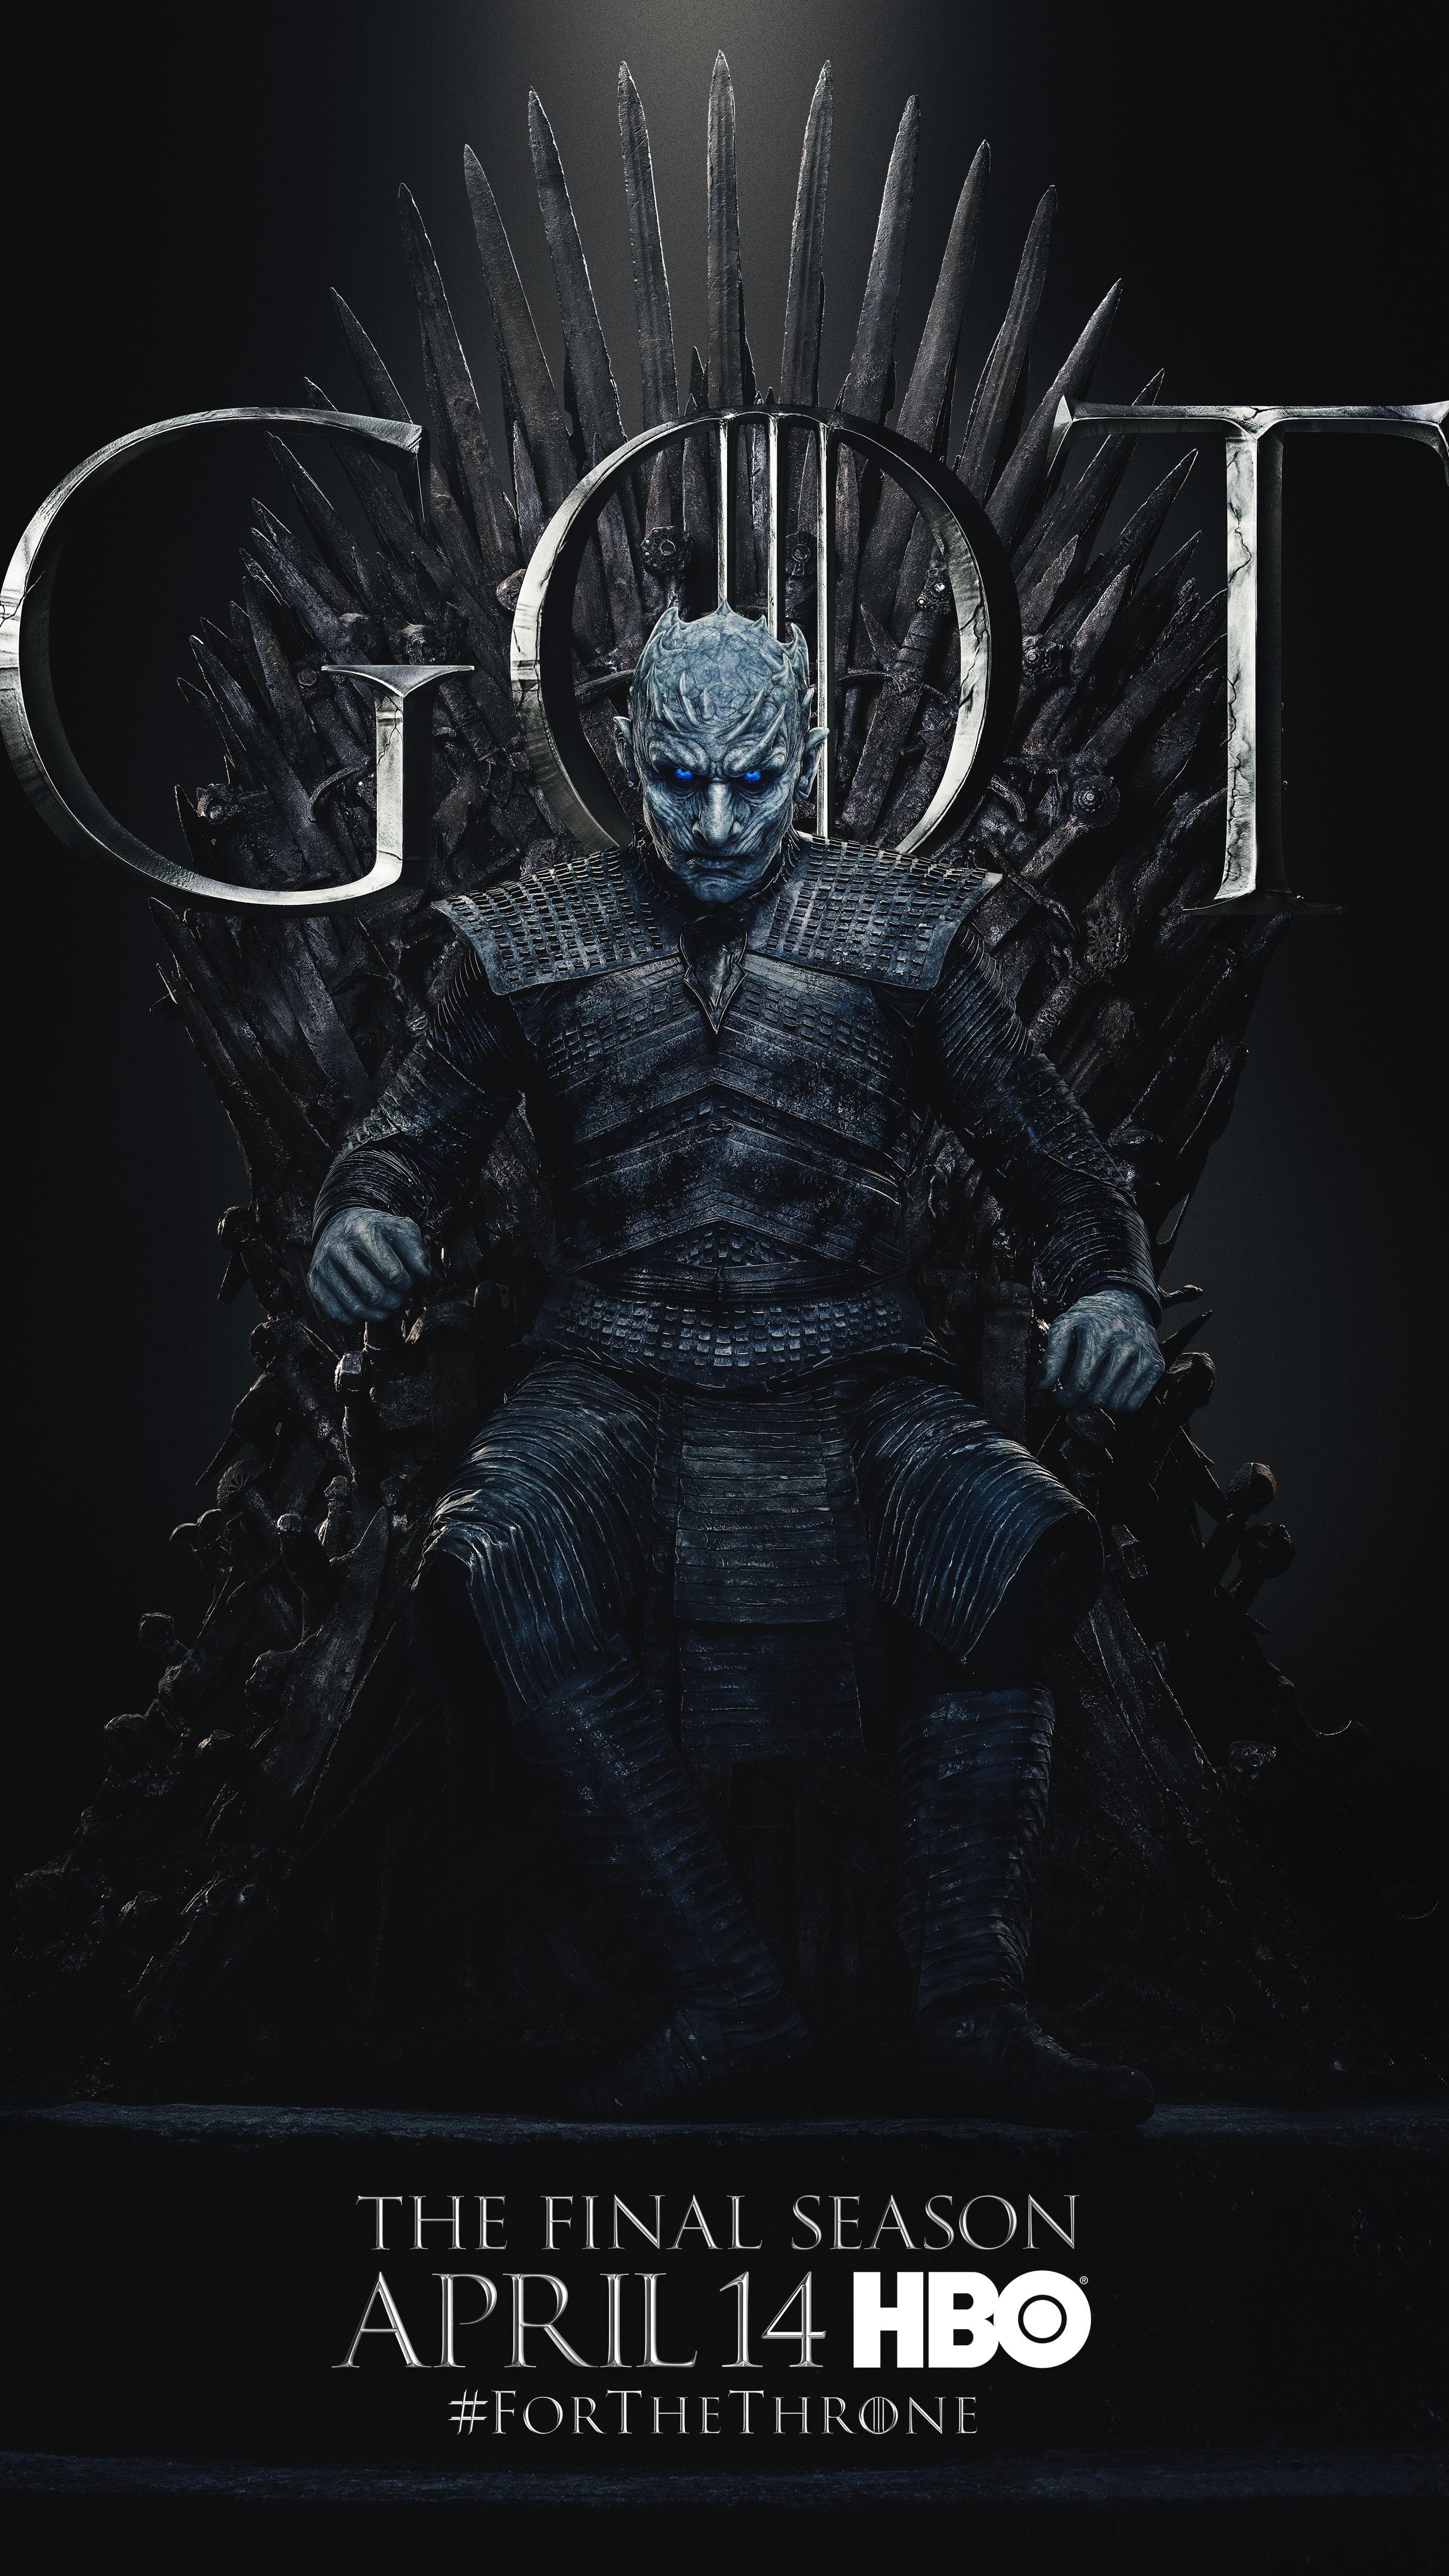 Jon Snow ou Deanerys Targaryen Game of Thrones figurines-nuit King